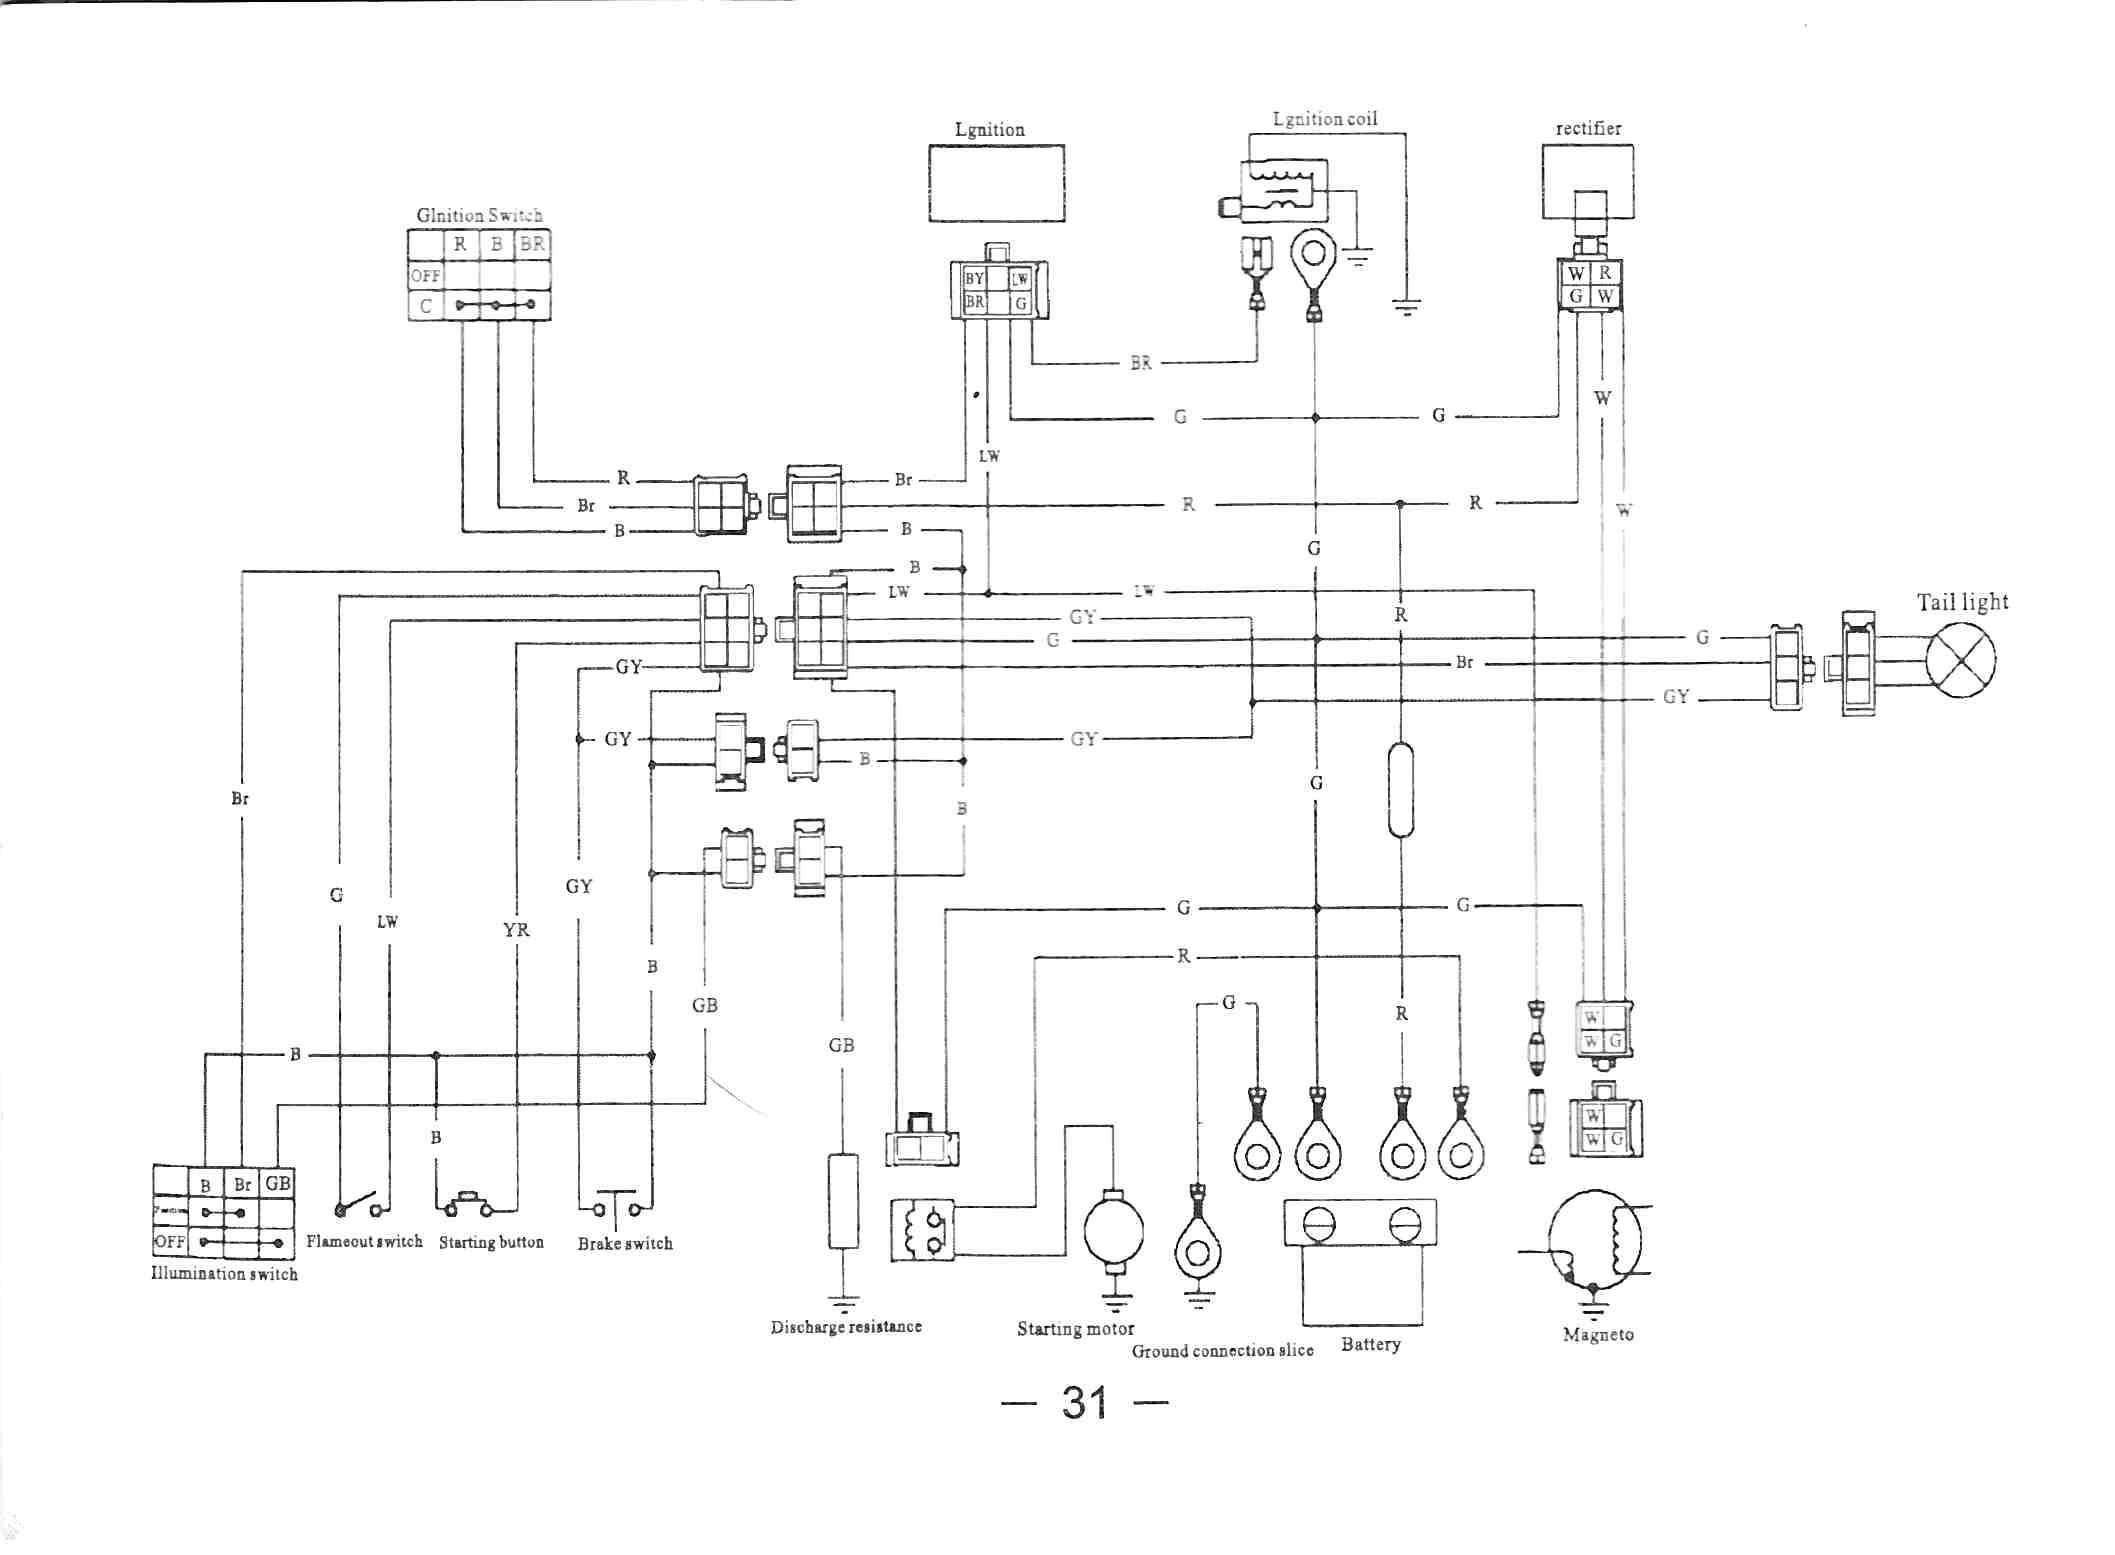 [SCHEMATICS_4UK]  Zongshen 50cc Wiring Diagram Suzuki Wagon Wiring Diagram -  auto-bmw.crv.the-rocks.it | Zongshen 50cc Wiring Diagram |  | Bege Wiring Diagram Source Full Edition